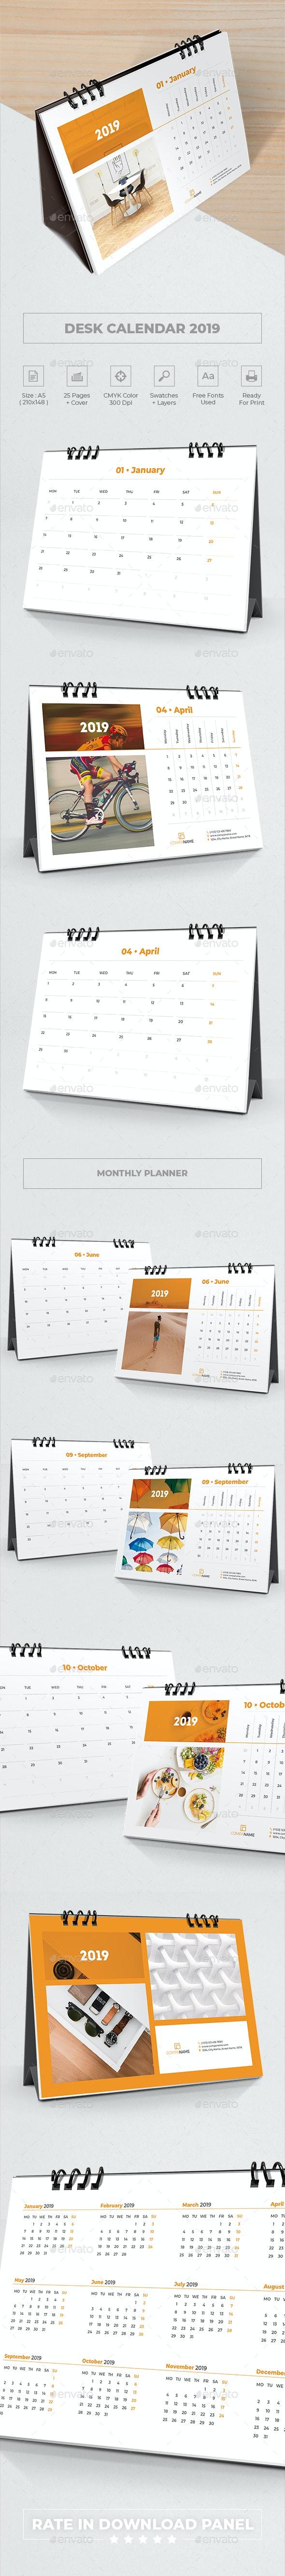 Desk Calendar 2019 Planner - Calendars Stationery